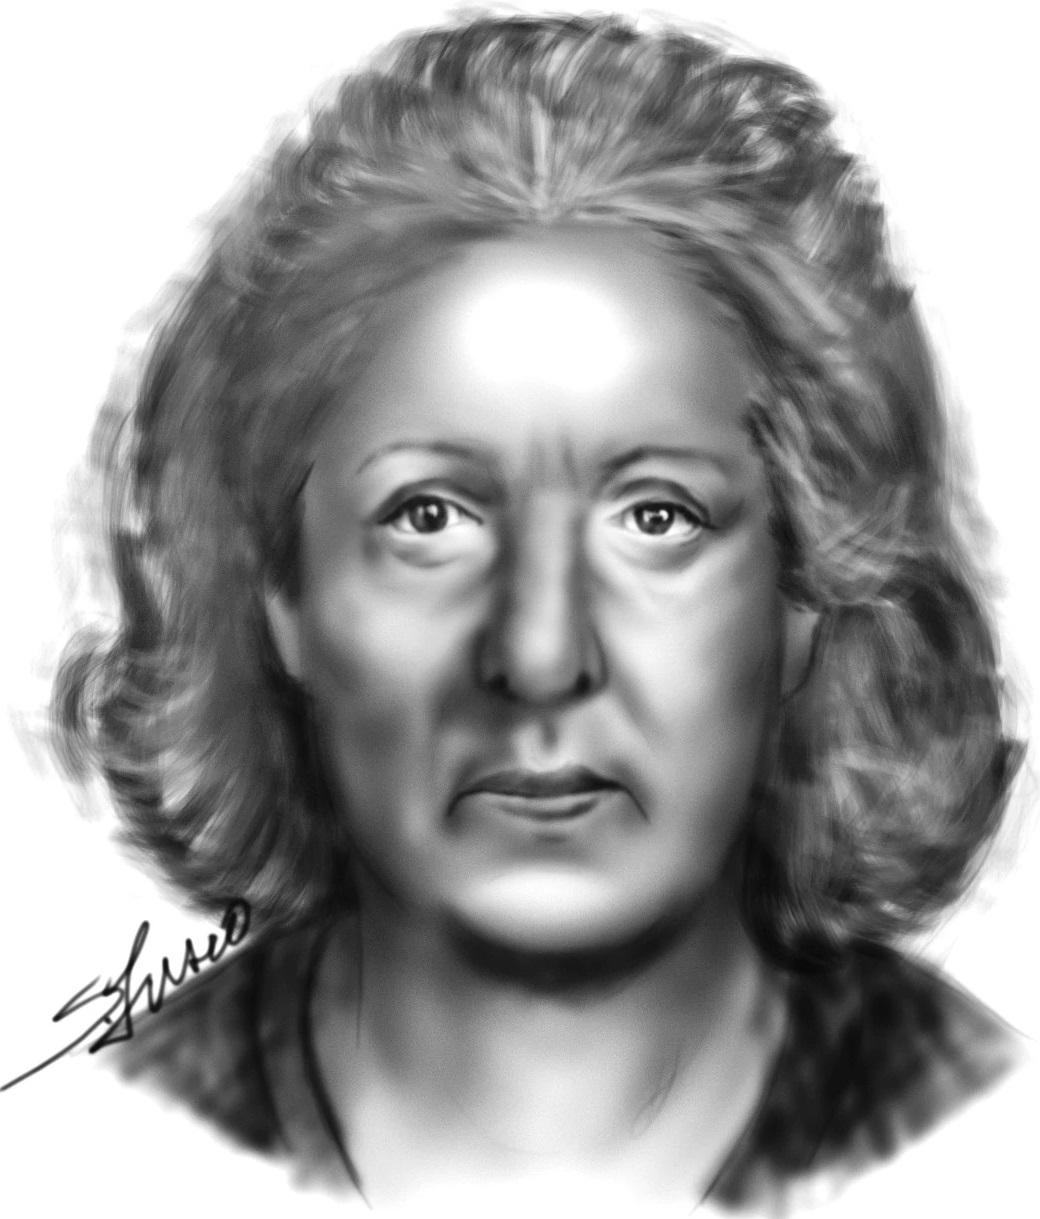 Seminole County Jane Doe (1974)